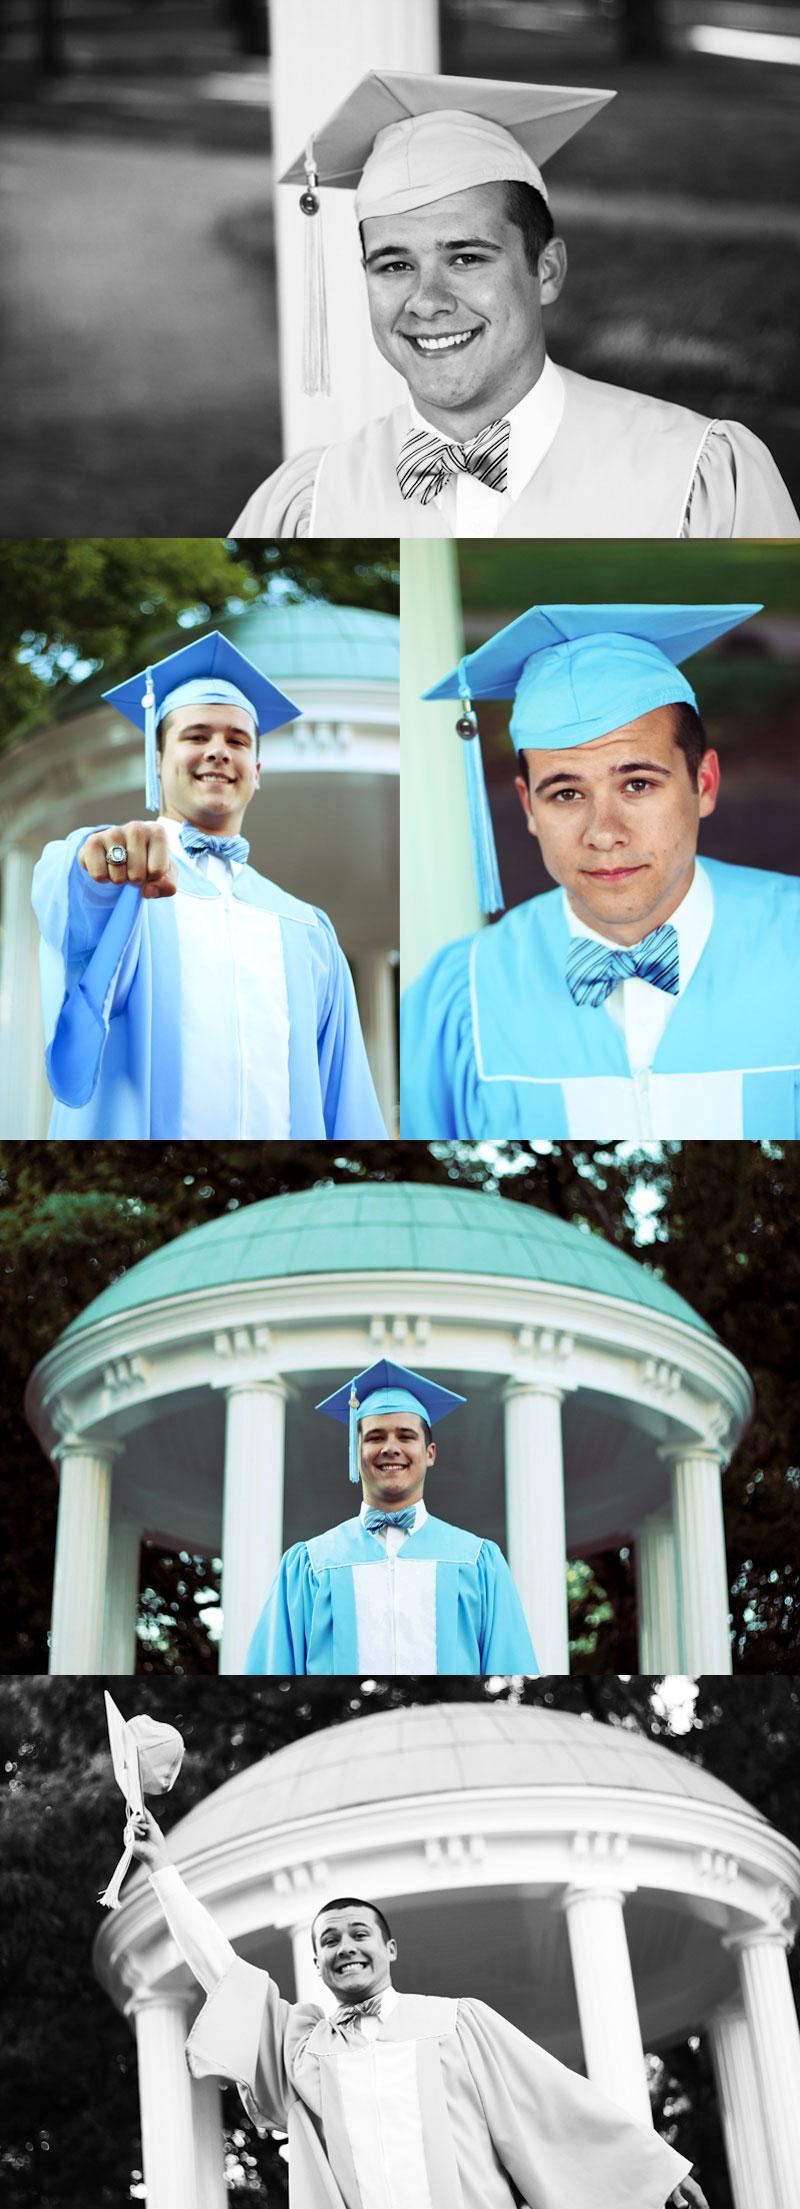 2011 Graduate Ethan Crews